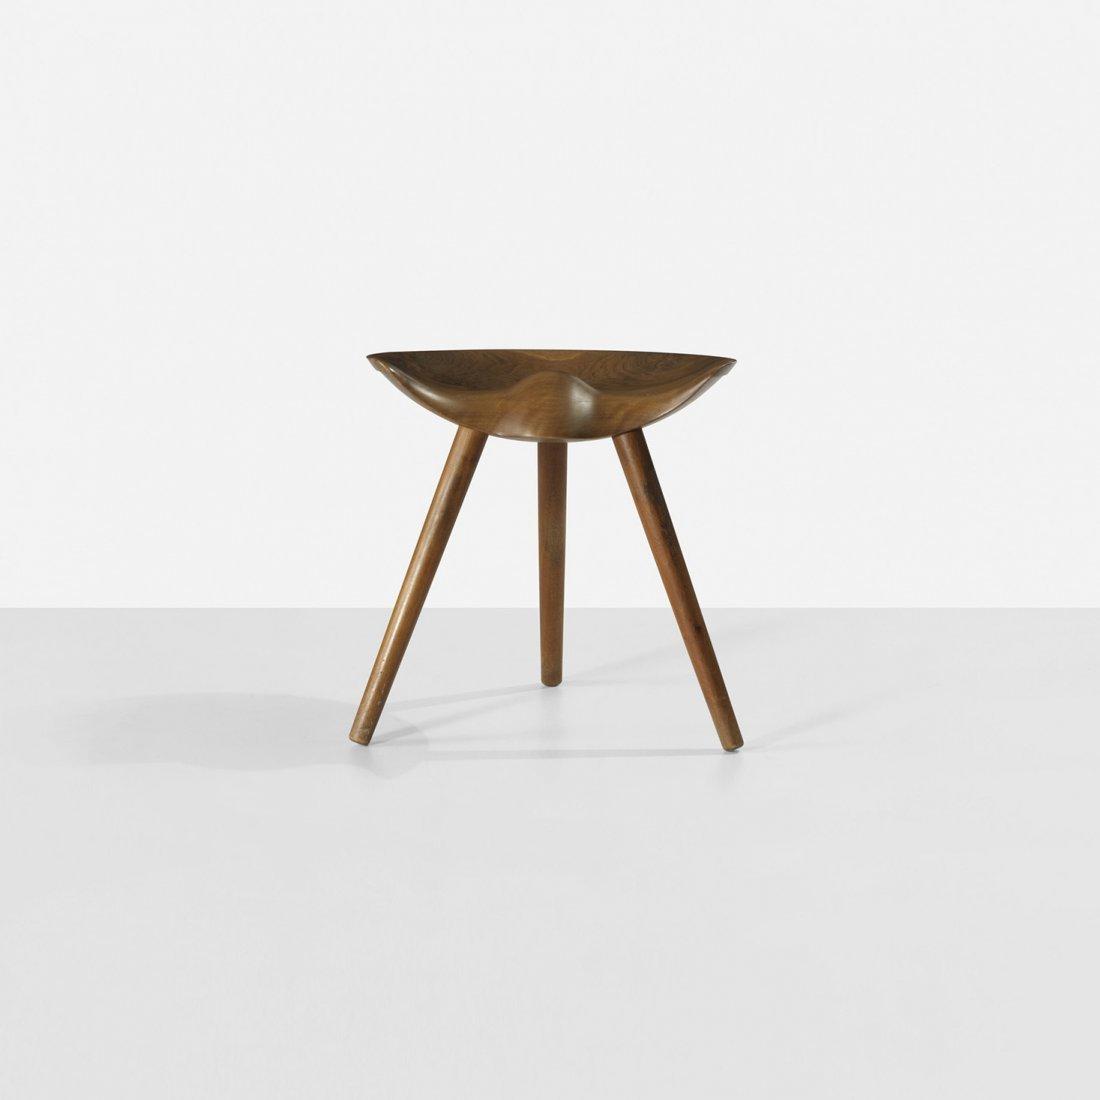 101: Mogens Lassen stool